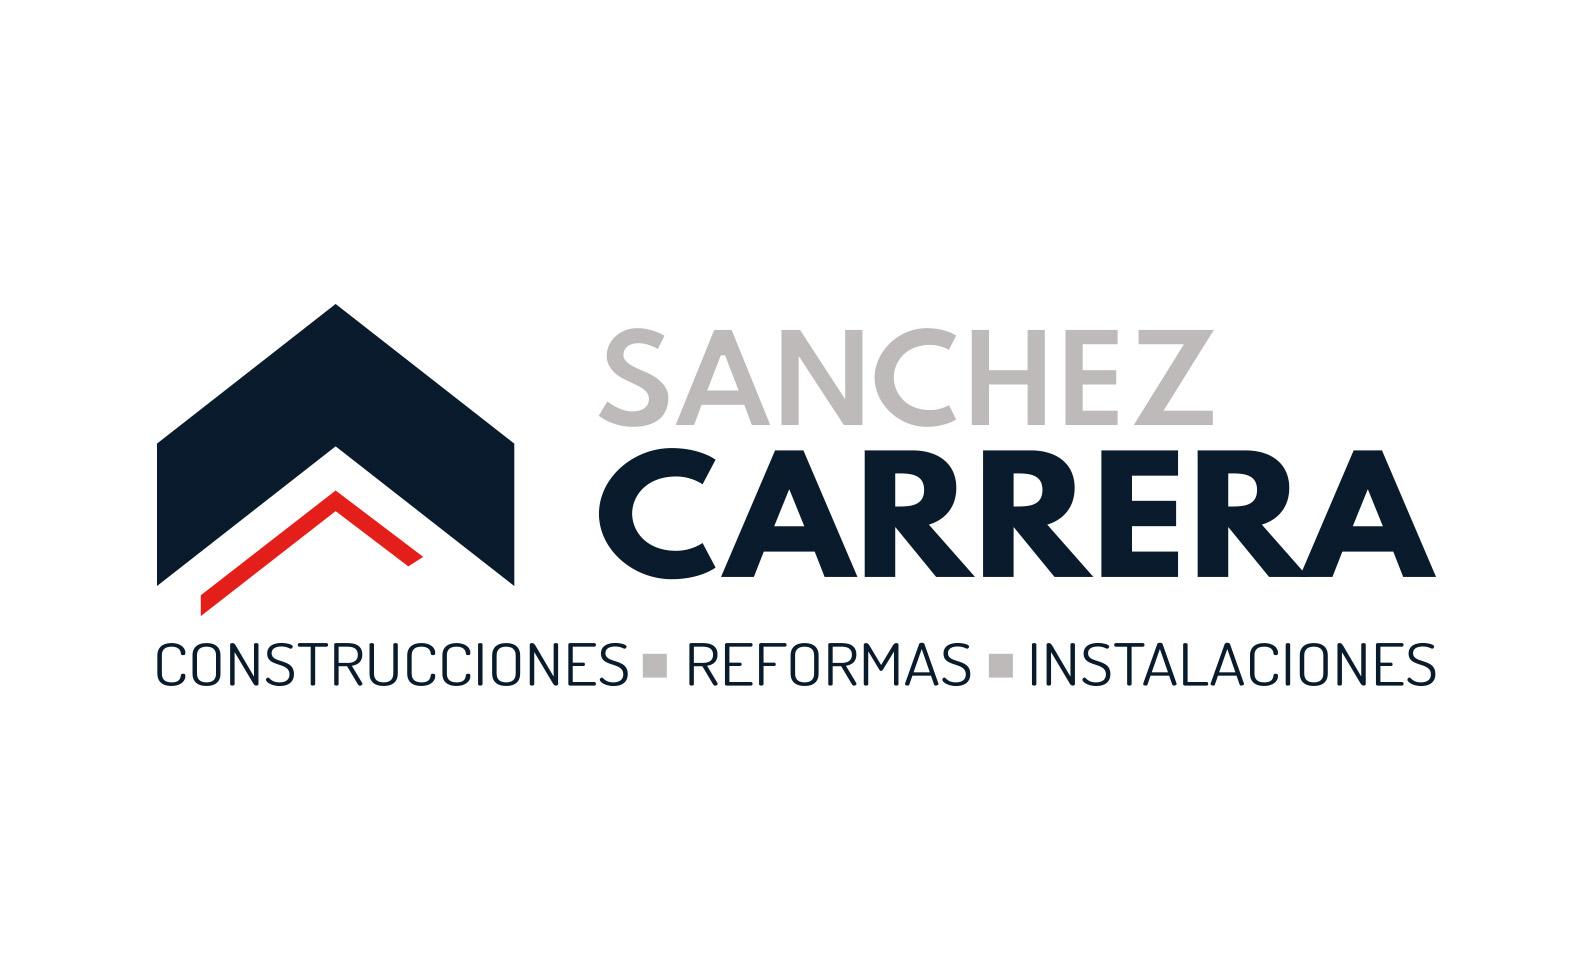 Sánchez Carrera